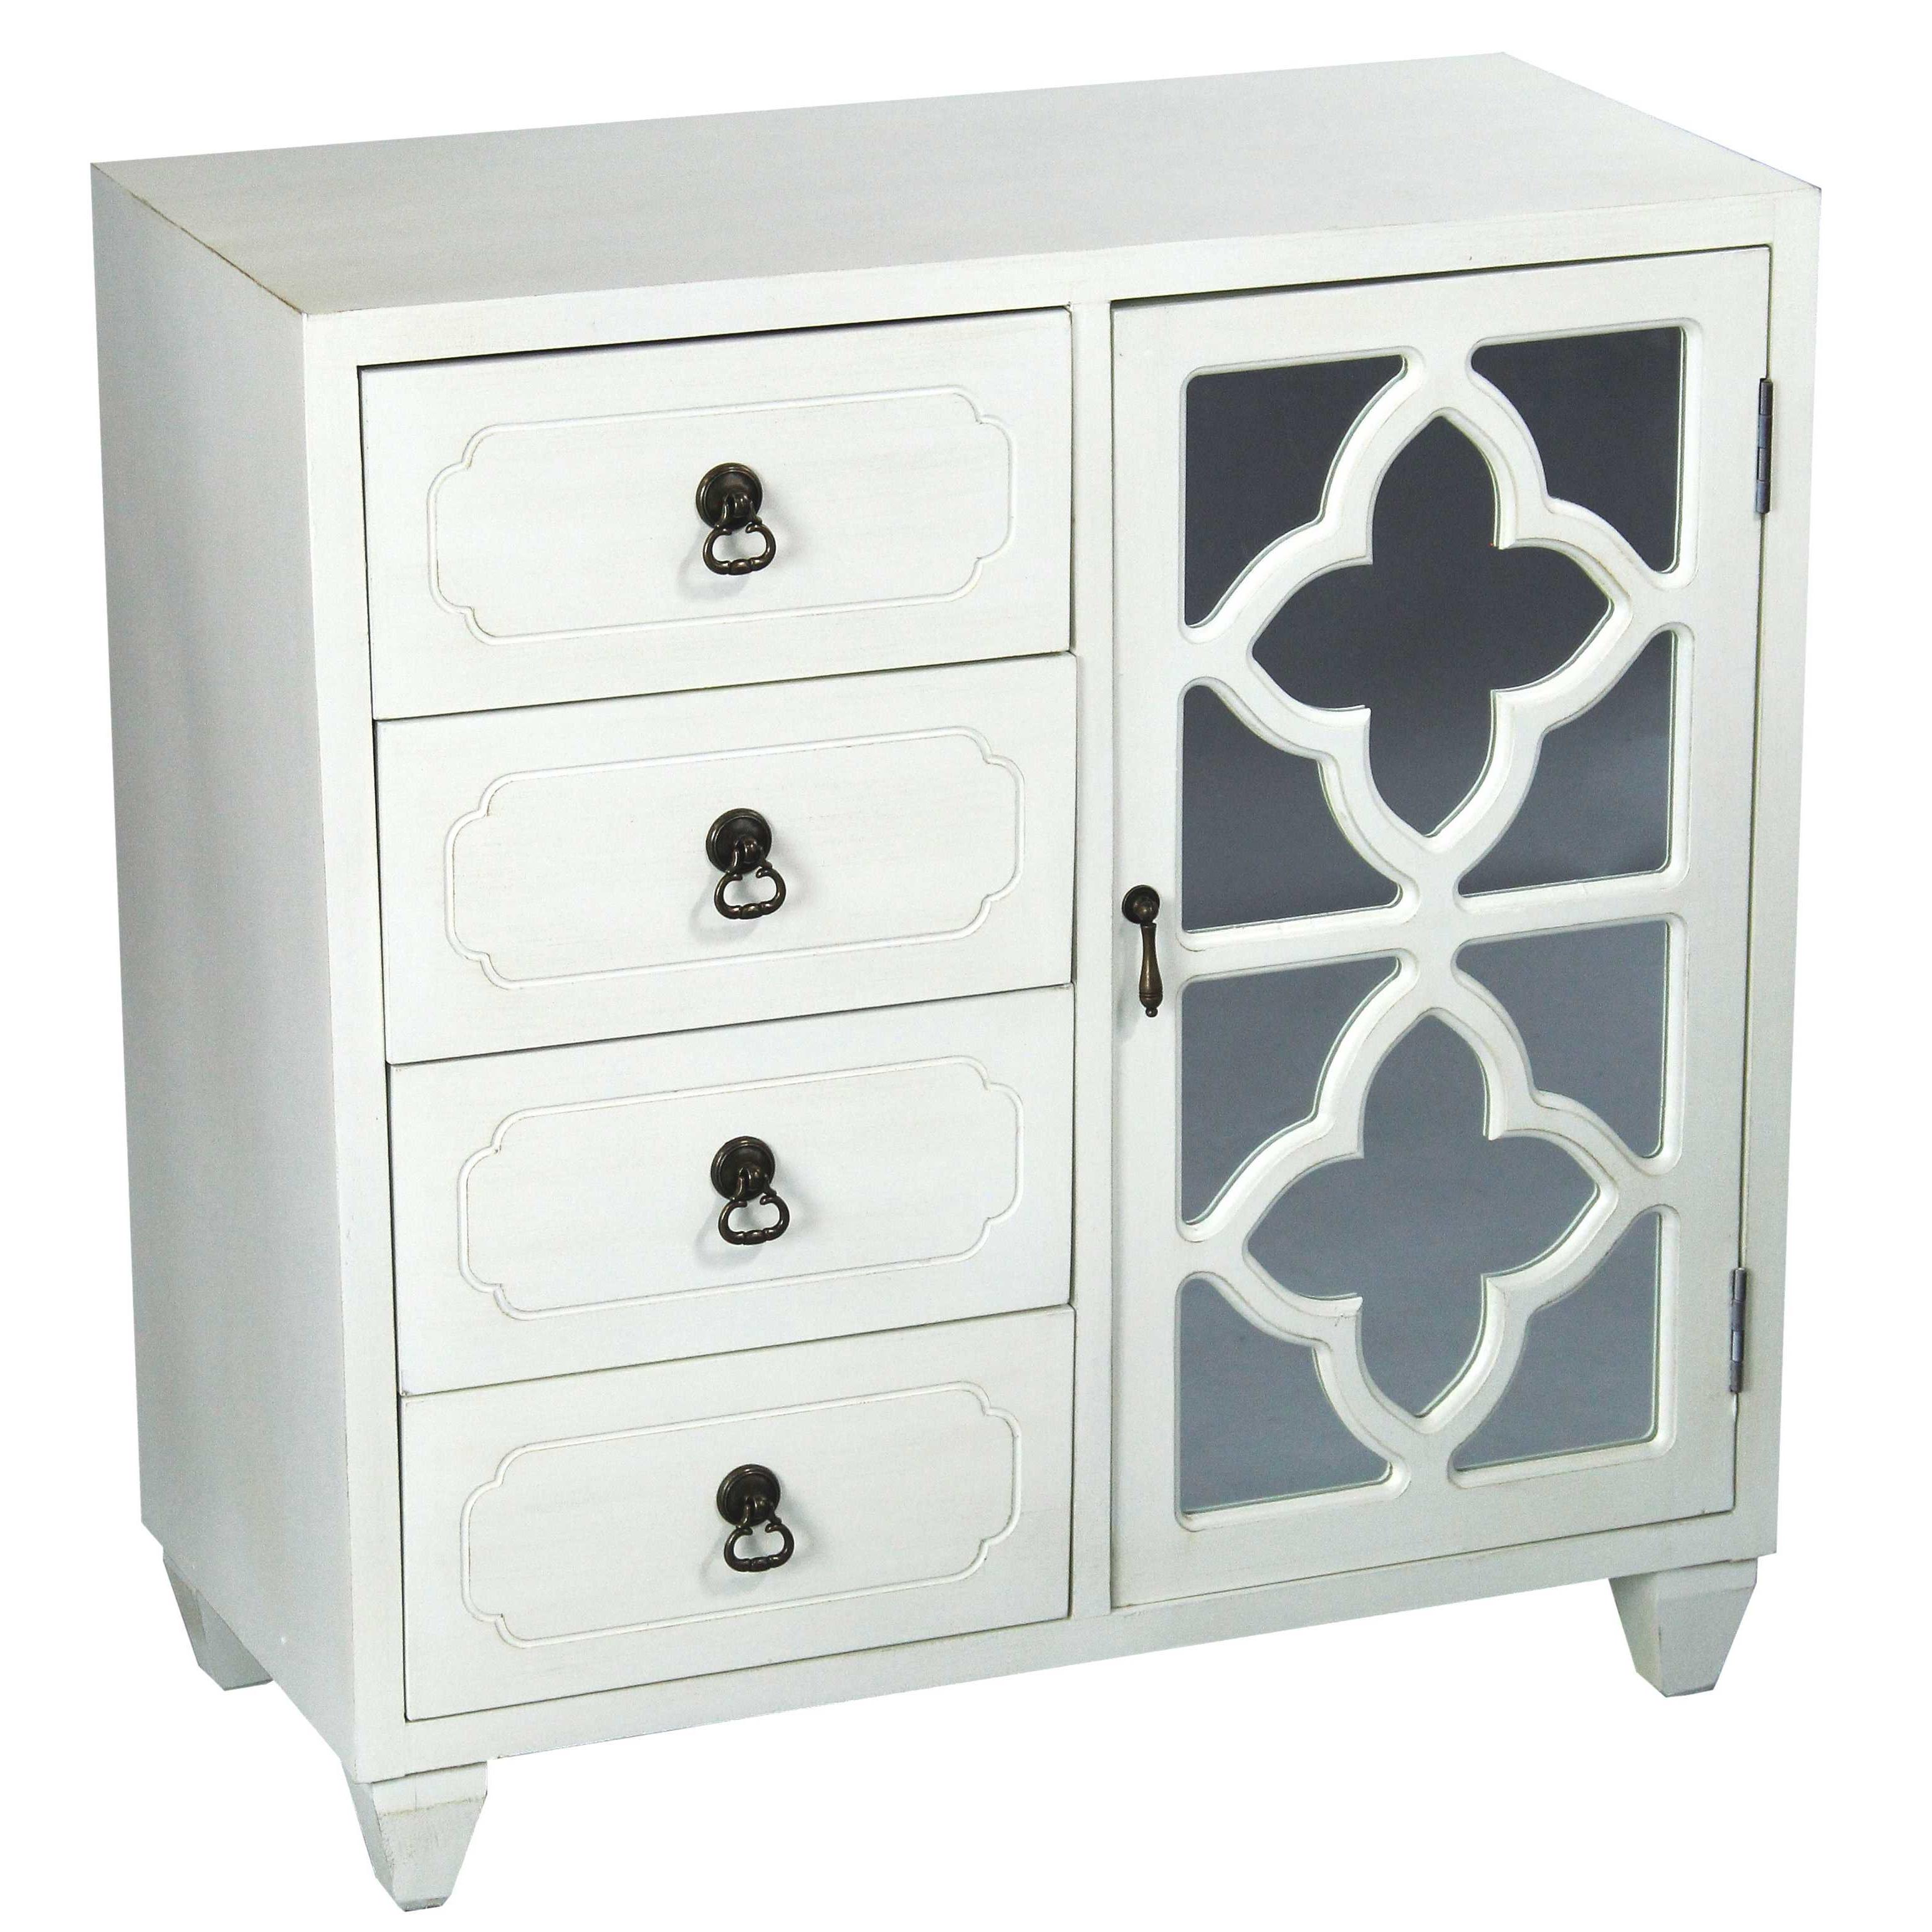 Drummond 4 Drawer Sideboards Intended For Trendy Kirtin 1 Door 4 Drawer Server (Gallery 7 of 20)